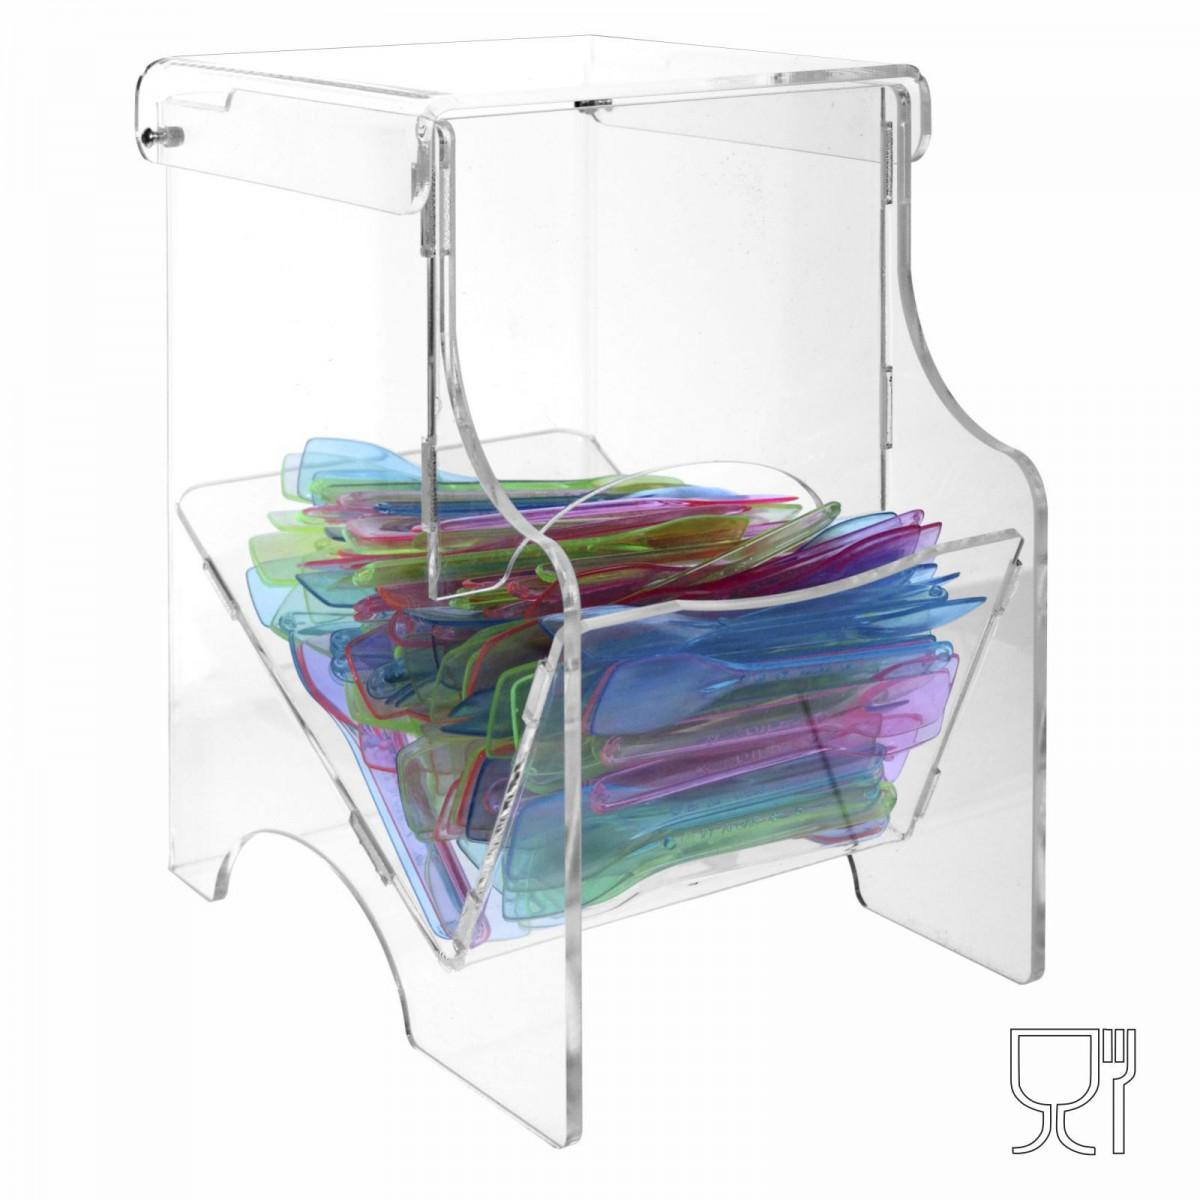 Porta palette e portacaramelle  in plexiglass trasparente - CM(LxPxH): 11.5x20x21